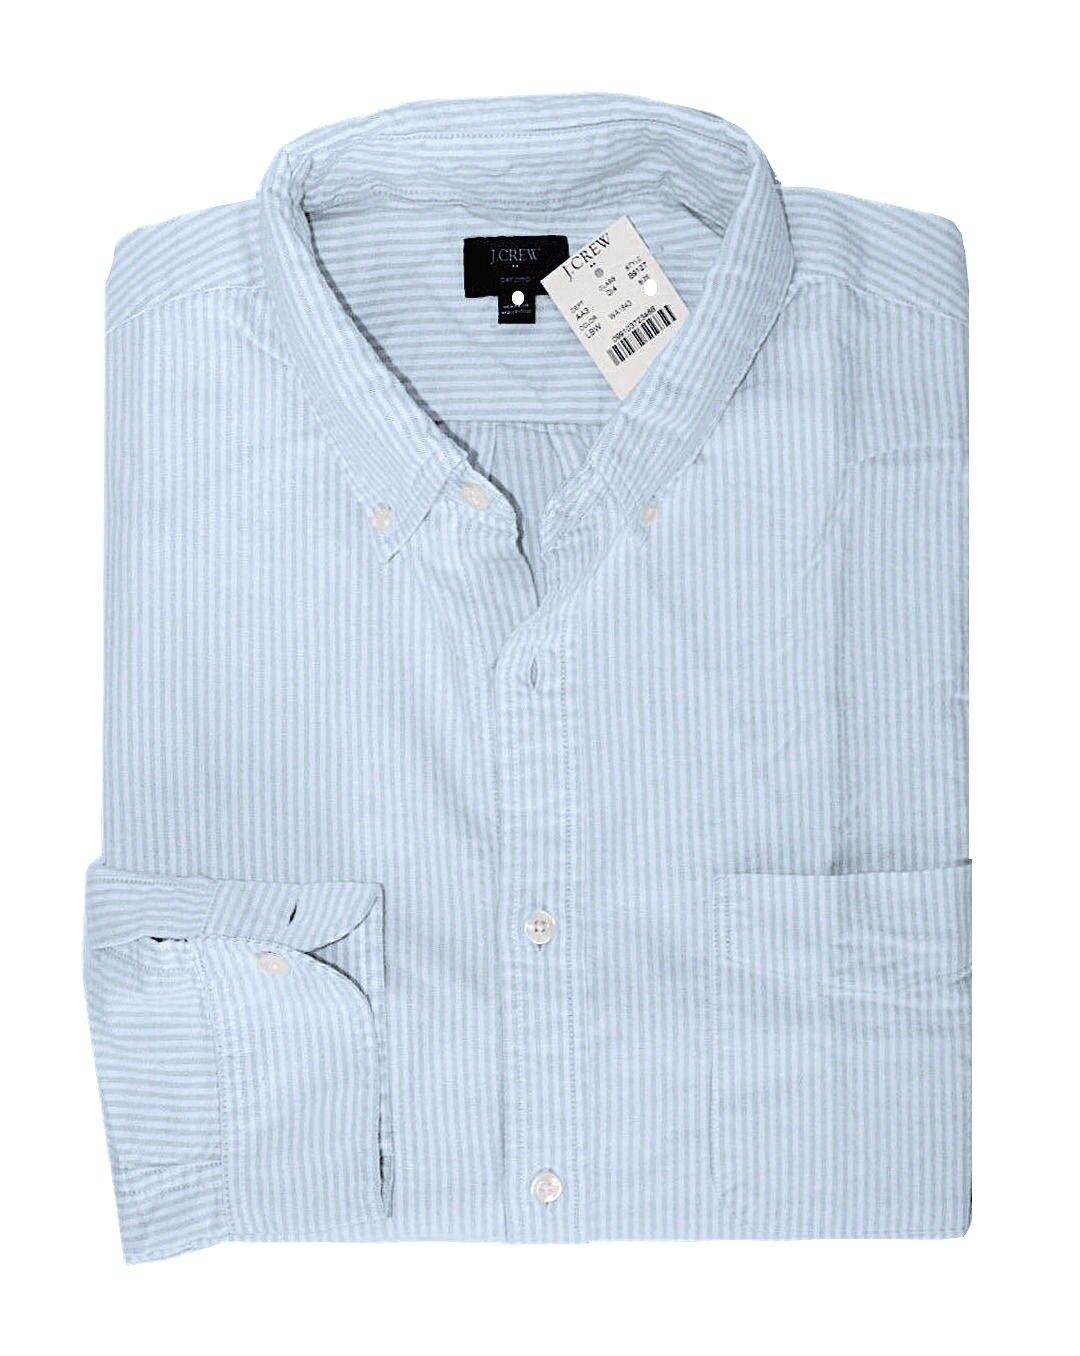 J Crew Factory - Men's XL - NWT - Slim Fit - bluee Striped Oxford Cotton Shirt